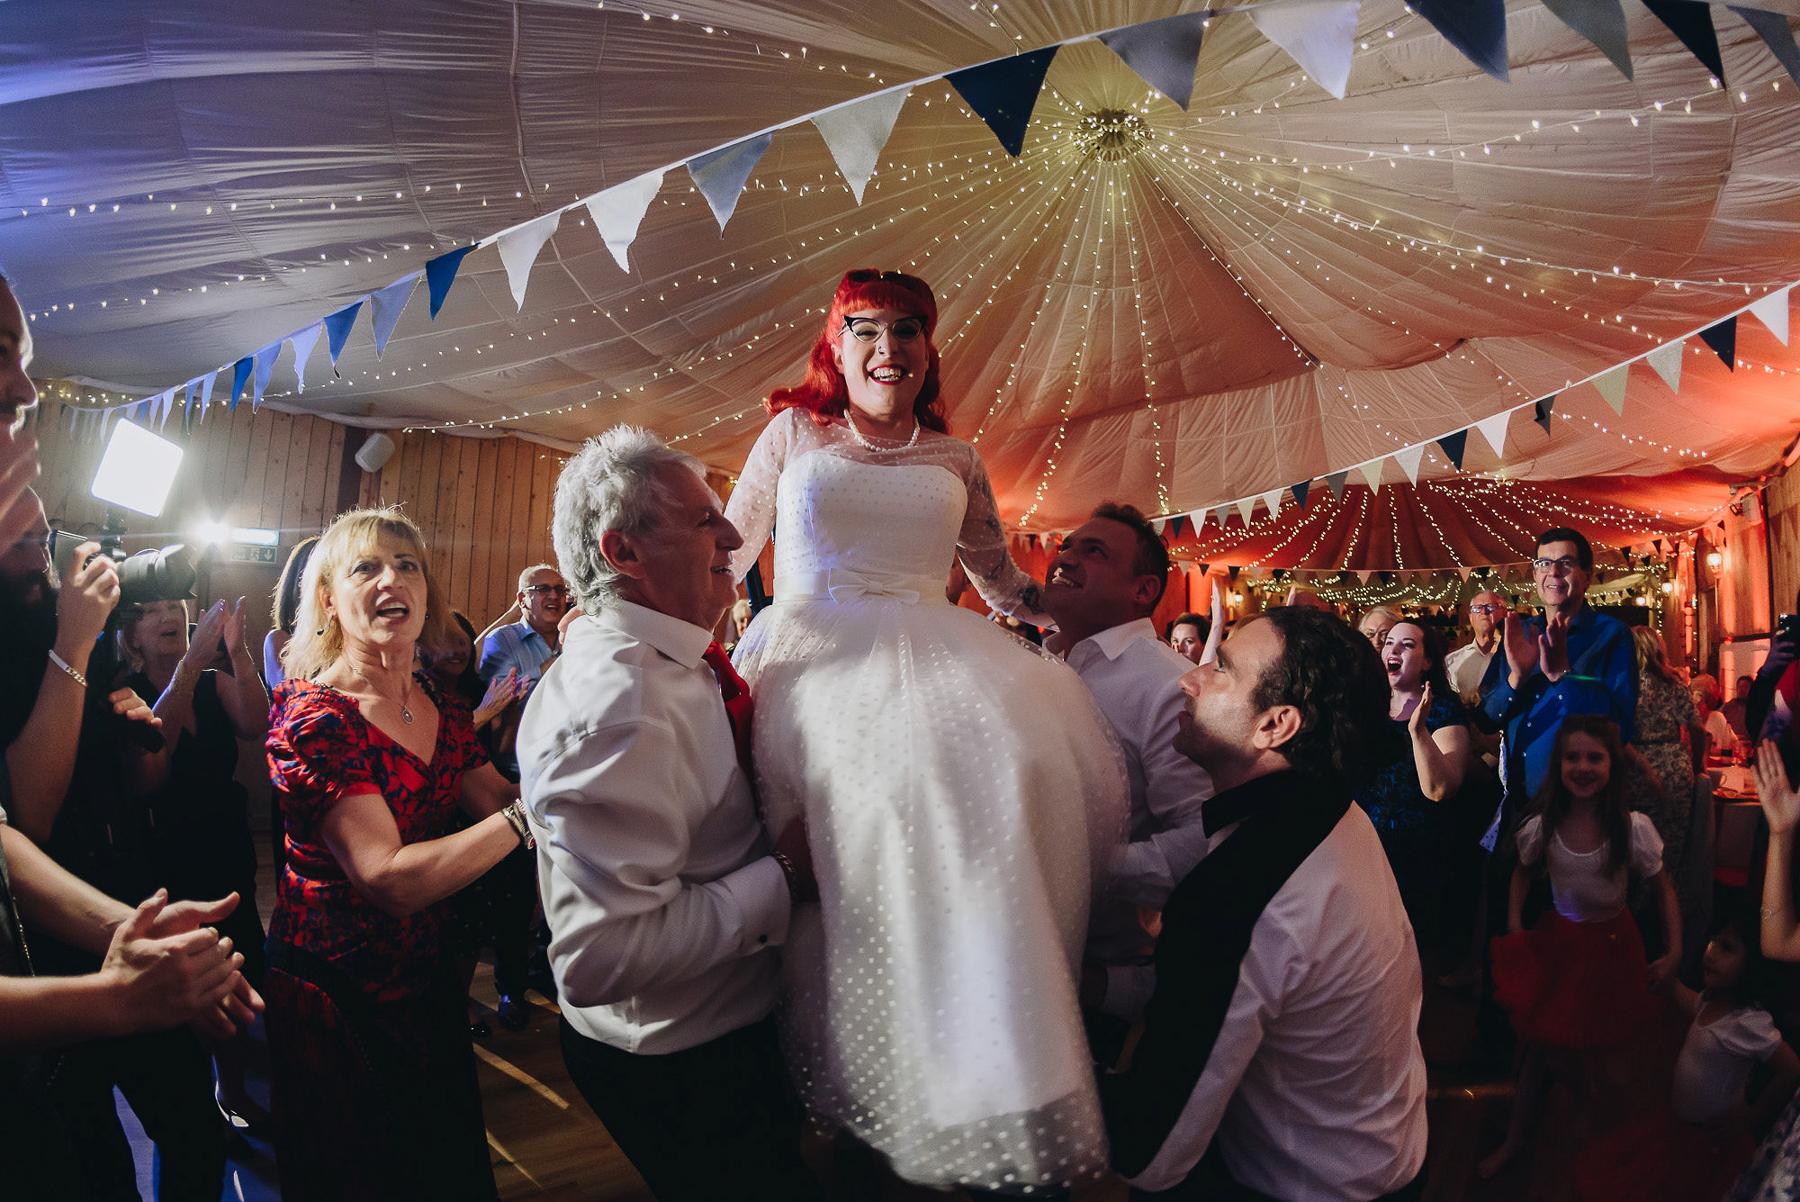 Wellbeing_Farm_Wedding_Photography_The_Pin-Up_Bride_Lara_Shaun-169.jpg